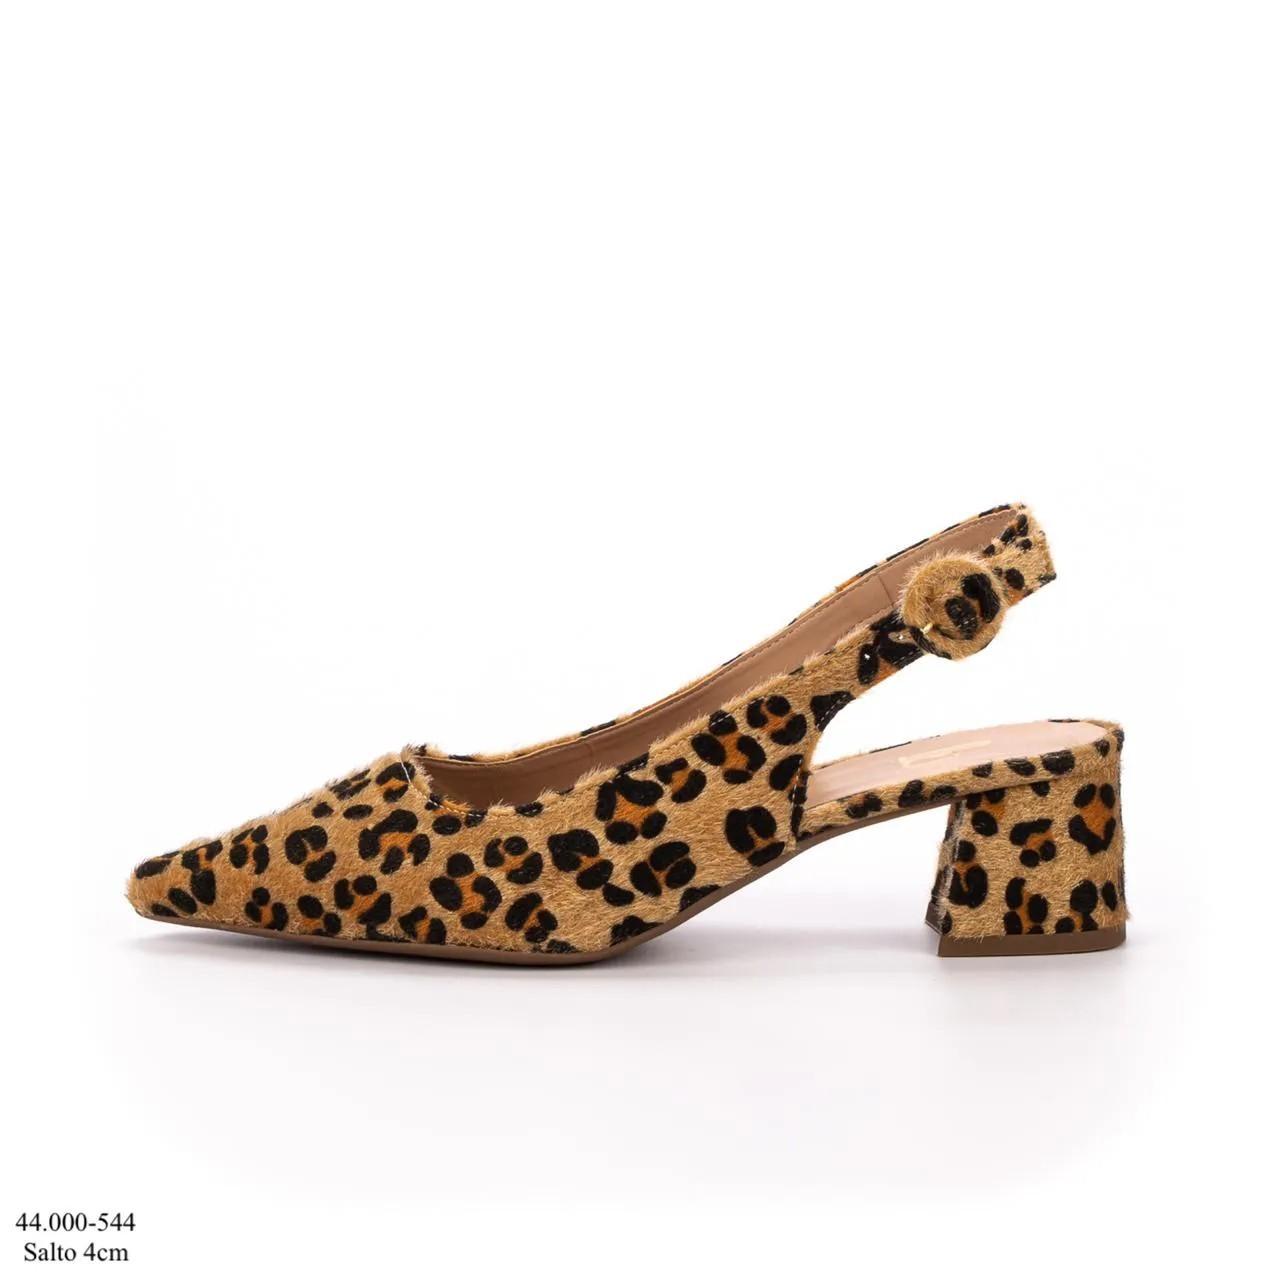 Scarpin Chanel Onça | D-47.000-544